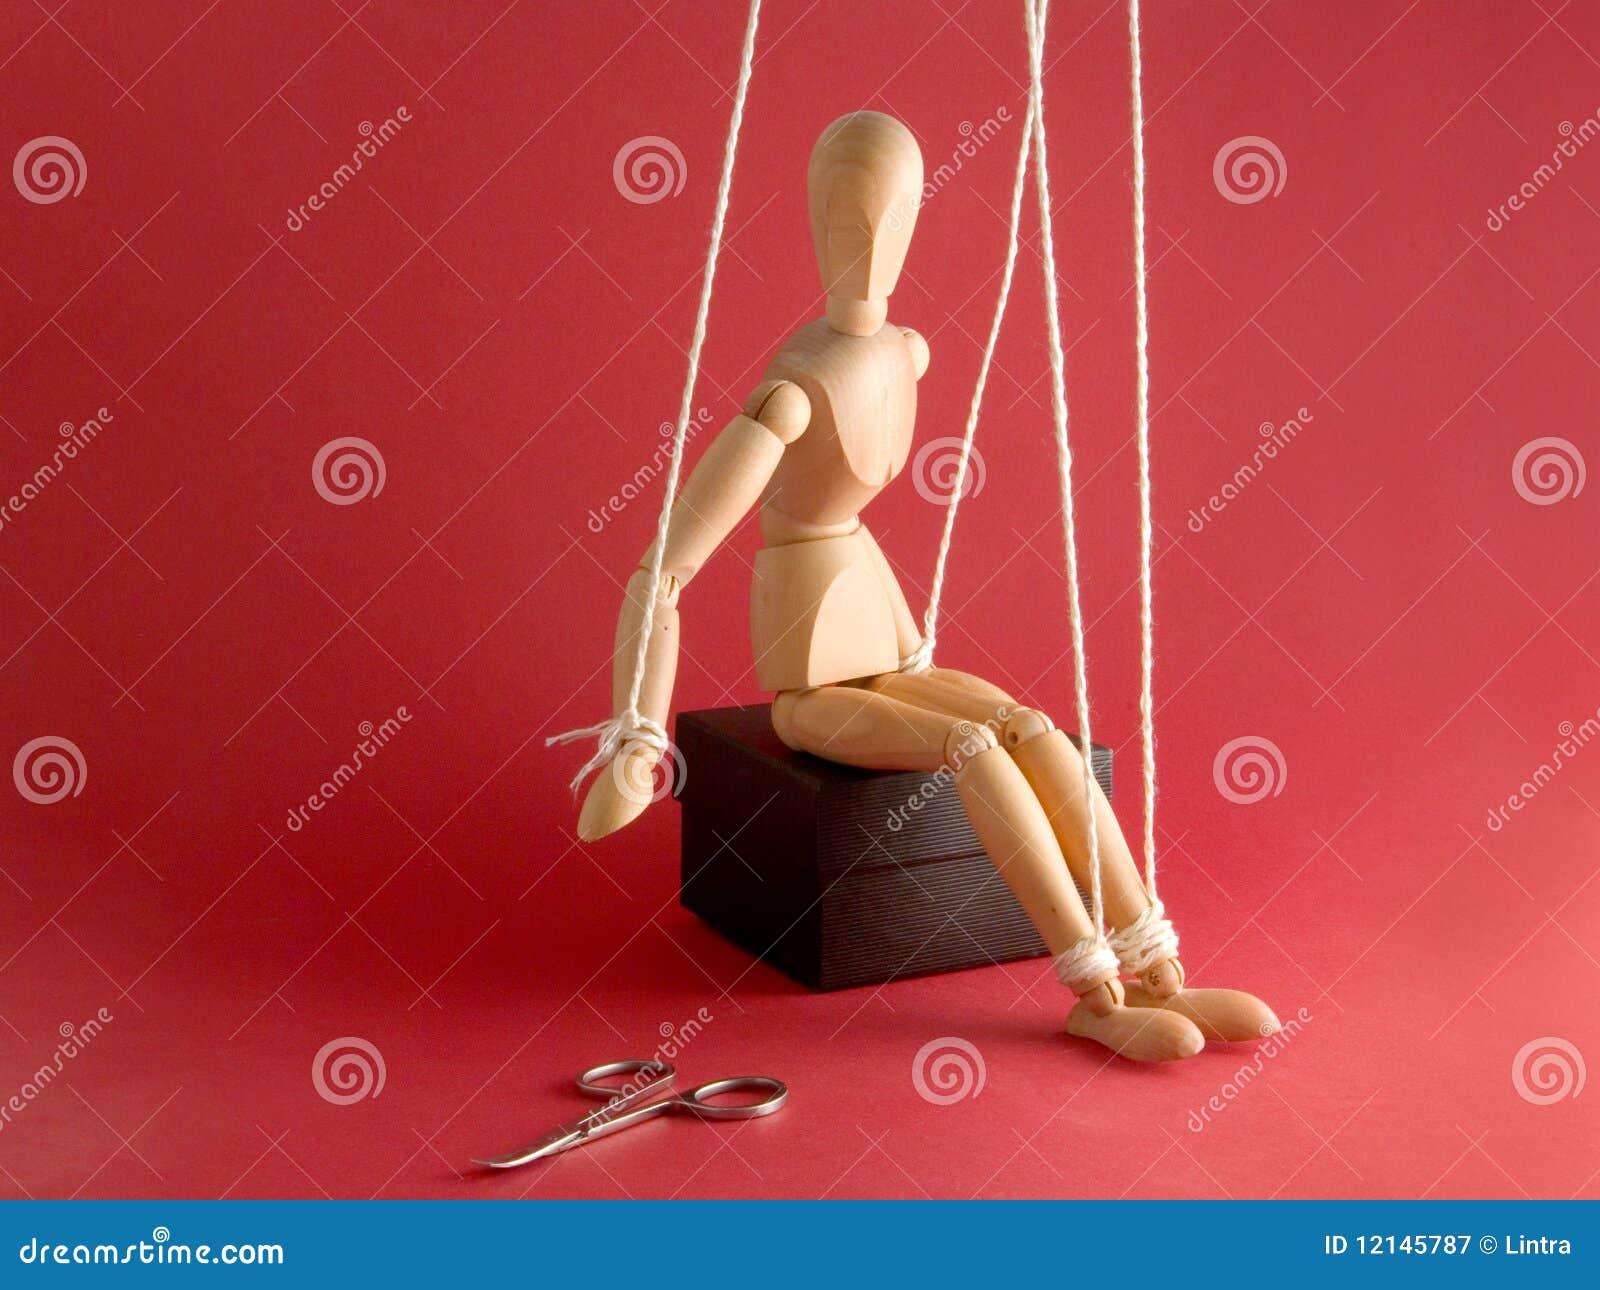 Wooden Mannequin and scissors